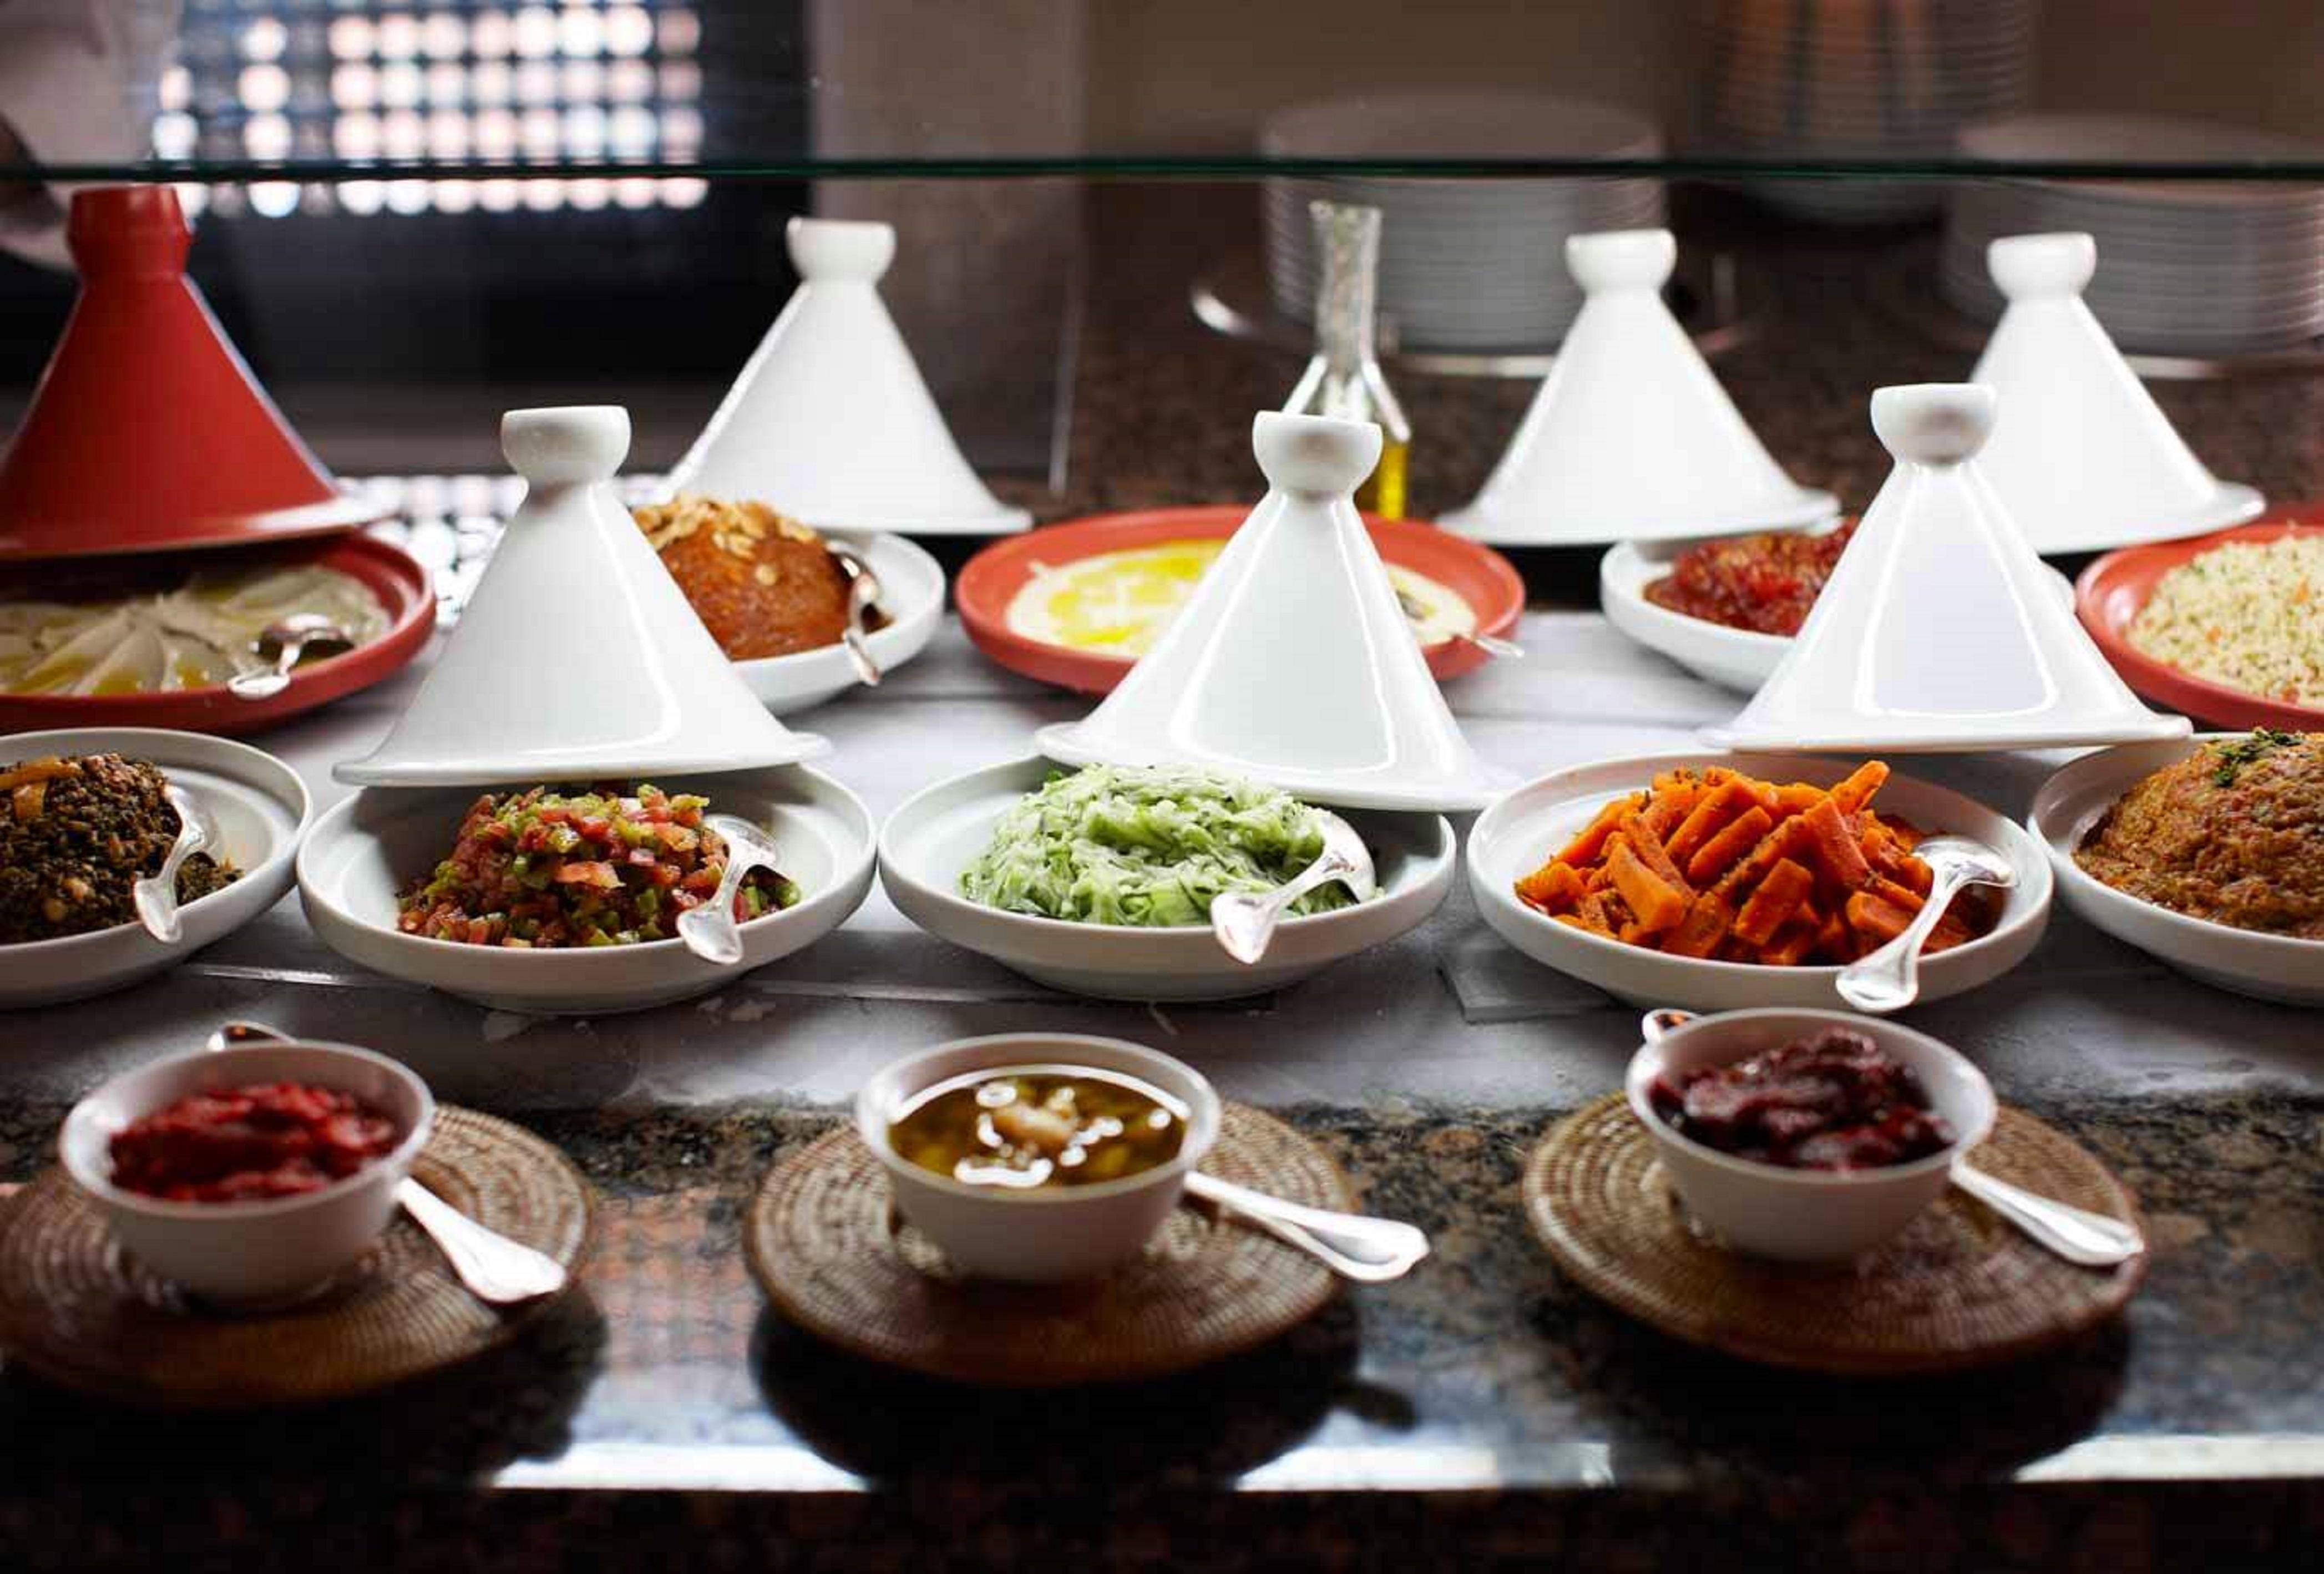 Marrakech - La Mamounia Restaurant Le Marocain 4